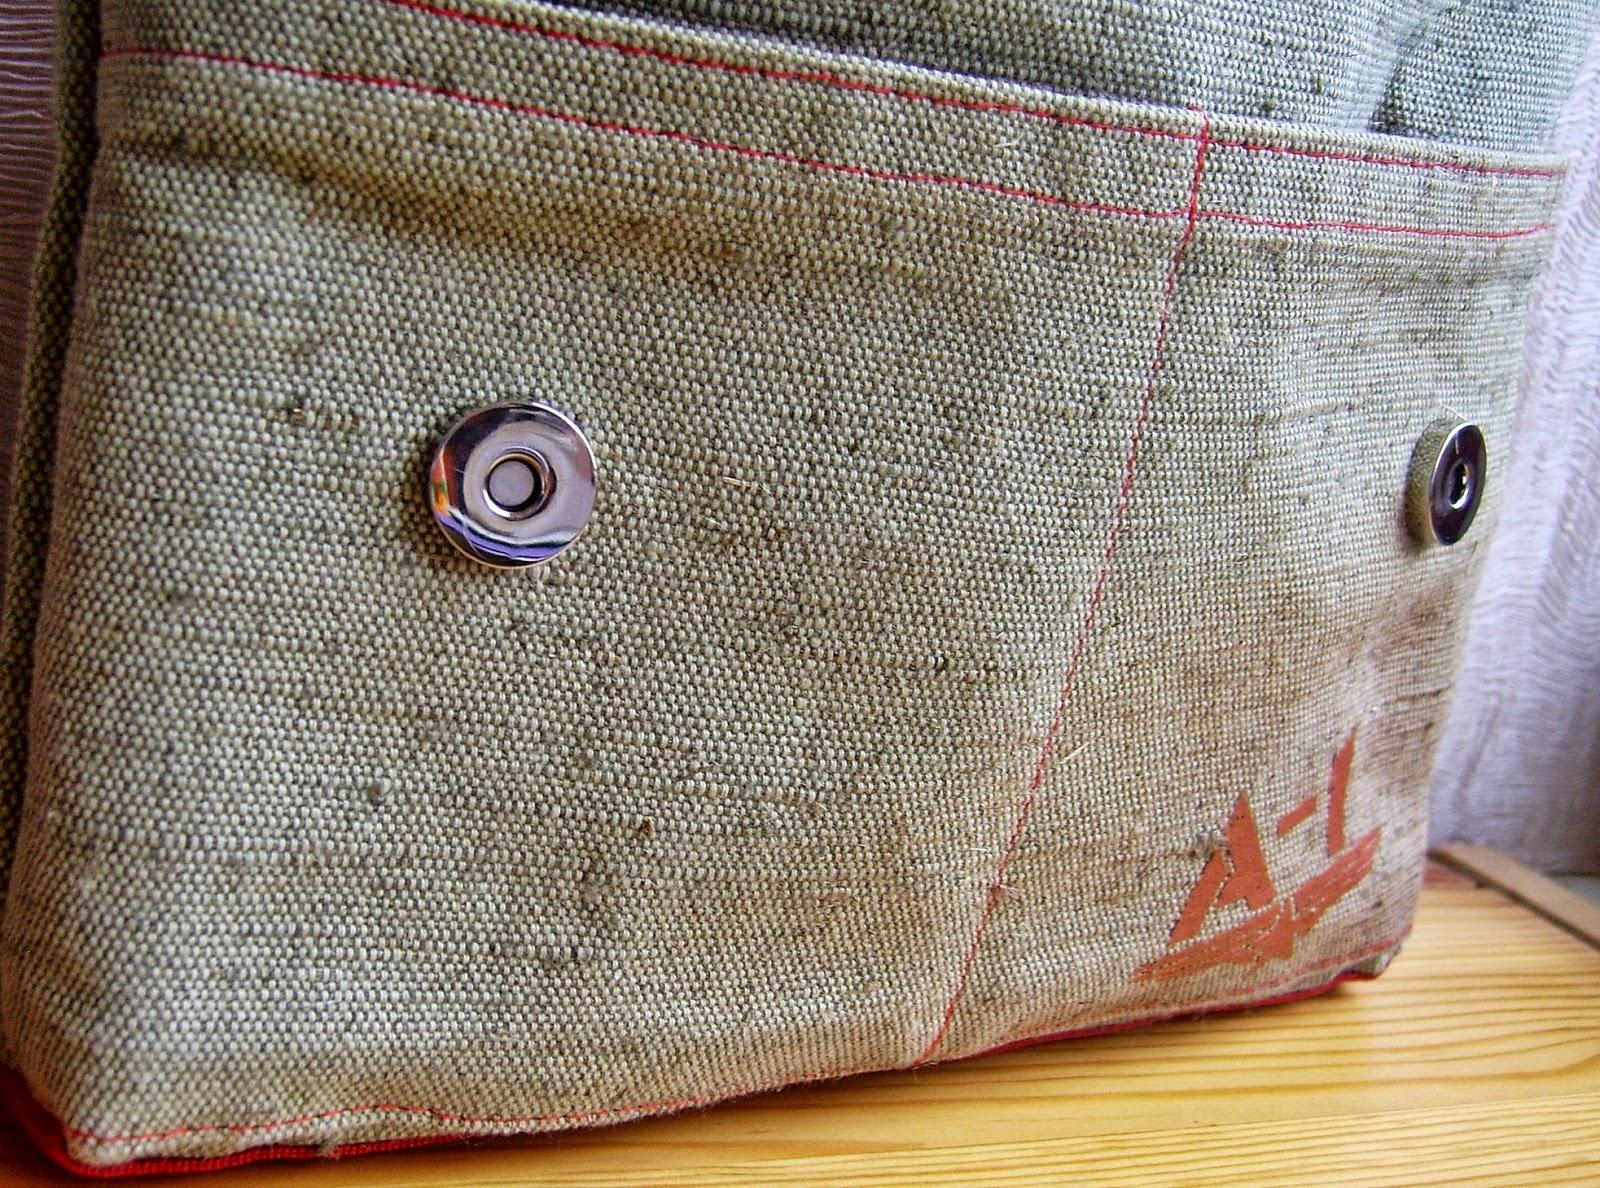 сумка-планшет, карманы и застежка